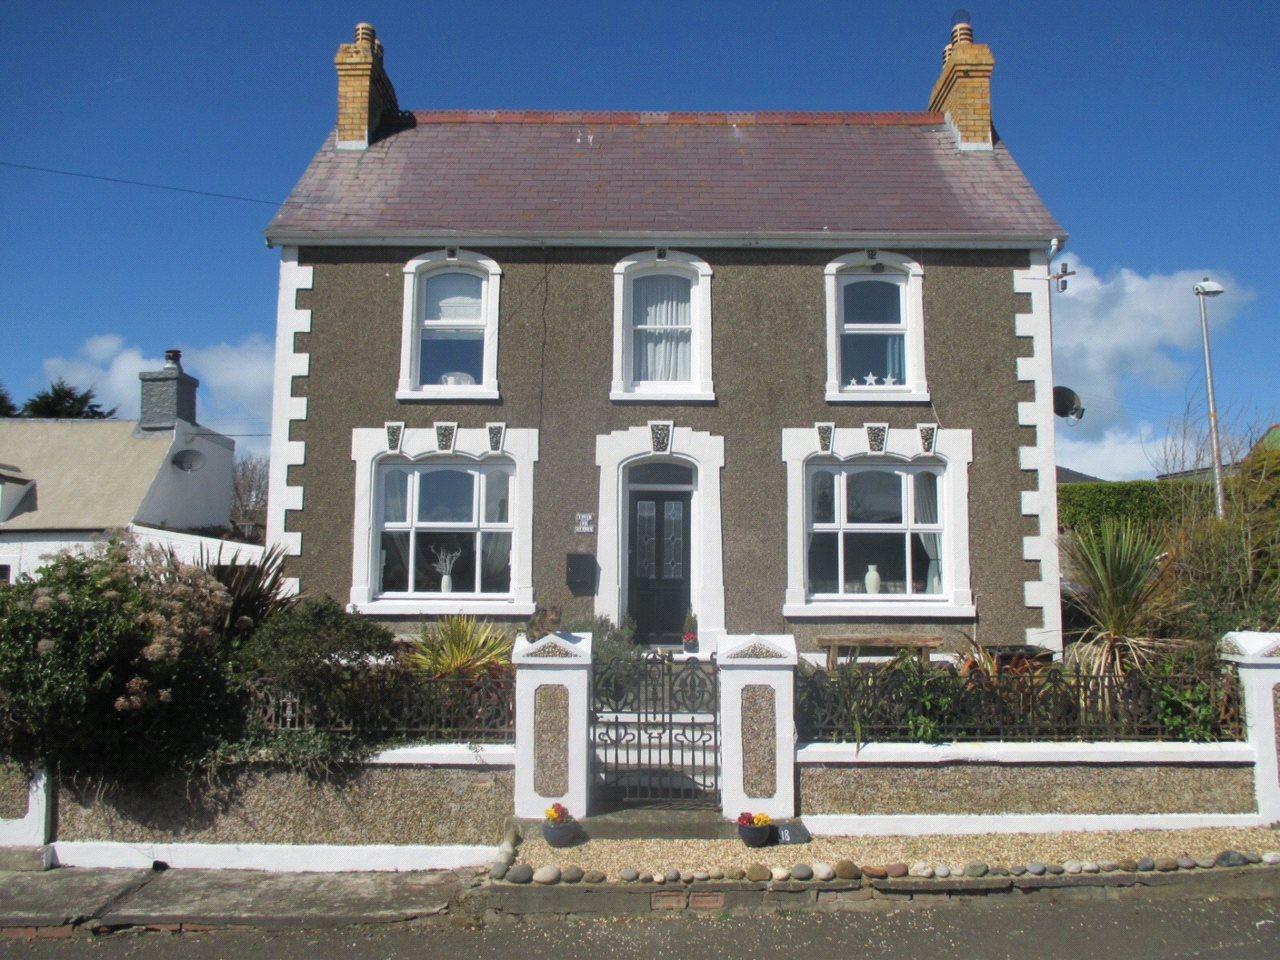 3 Bedrooms Detached House for sale in Ffordd Y Felin, Trefin, Trefin